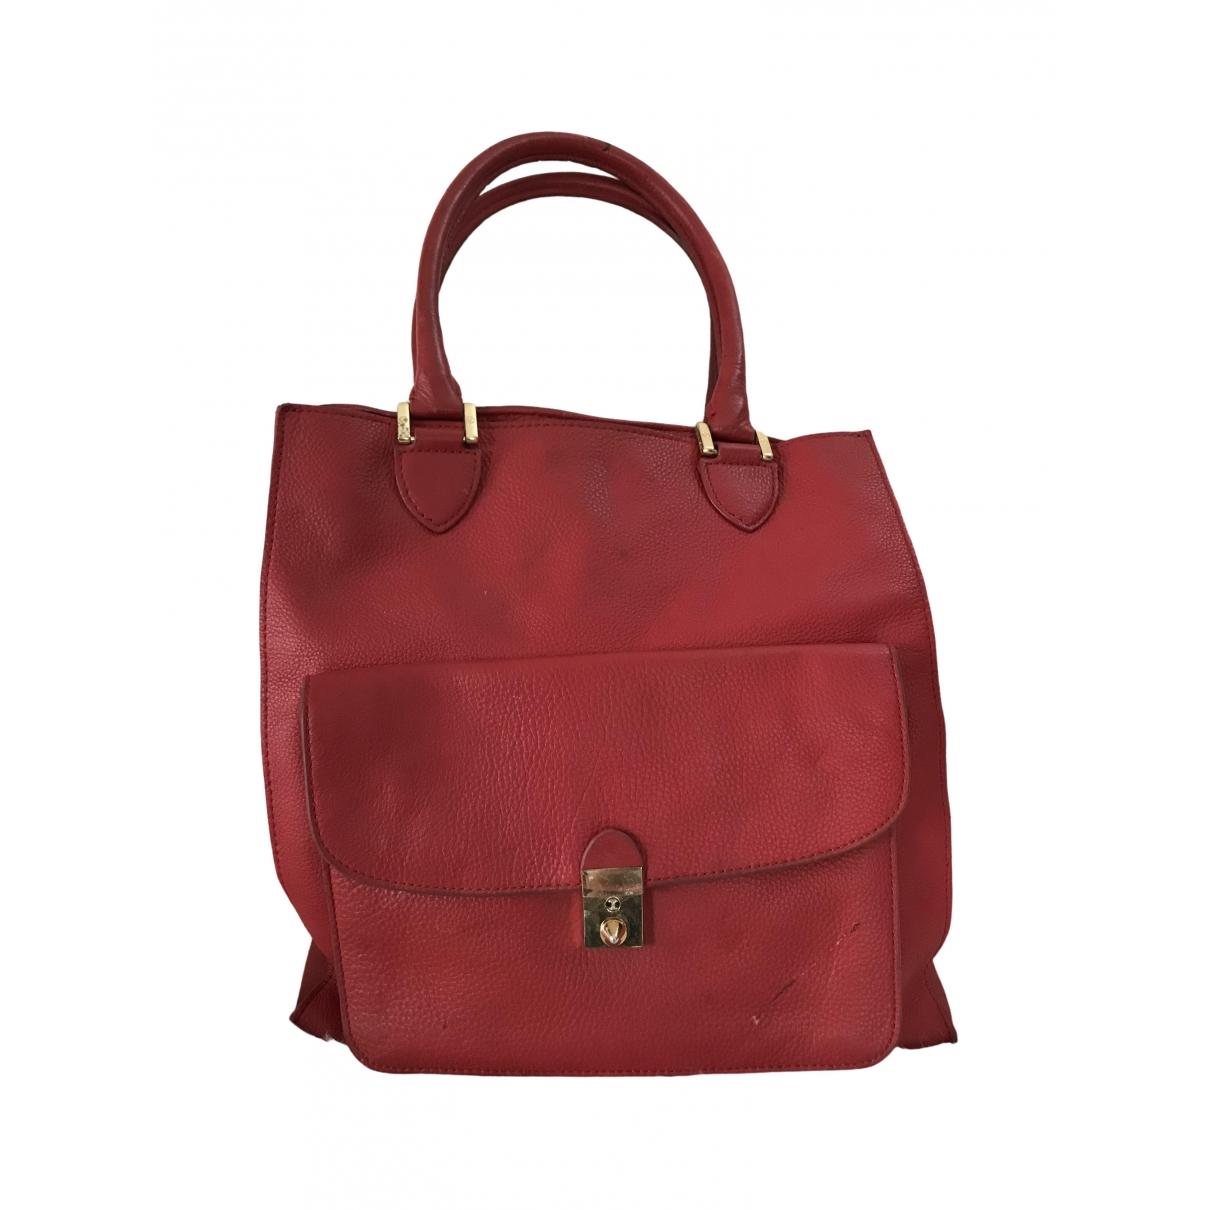 Tory Burch \N Red Leather handbag for Women \N